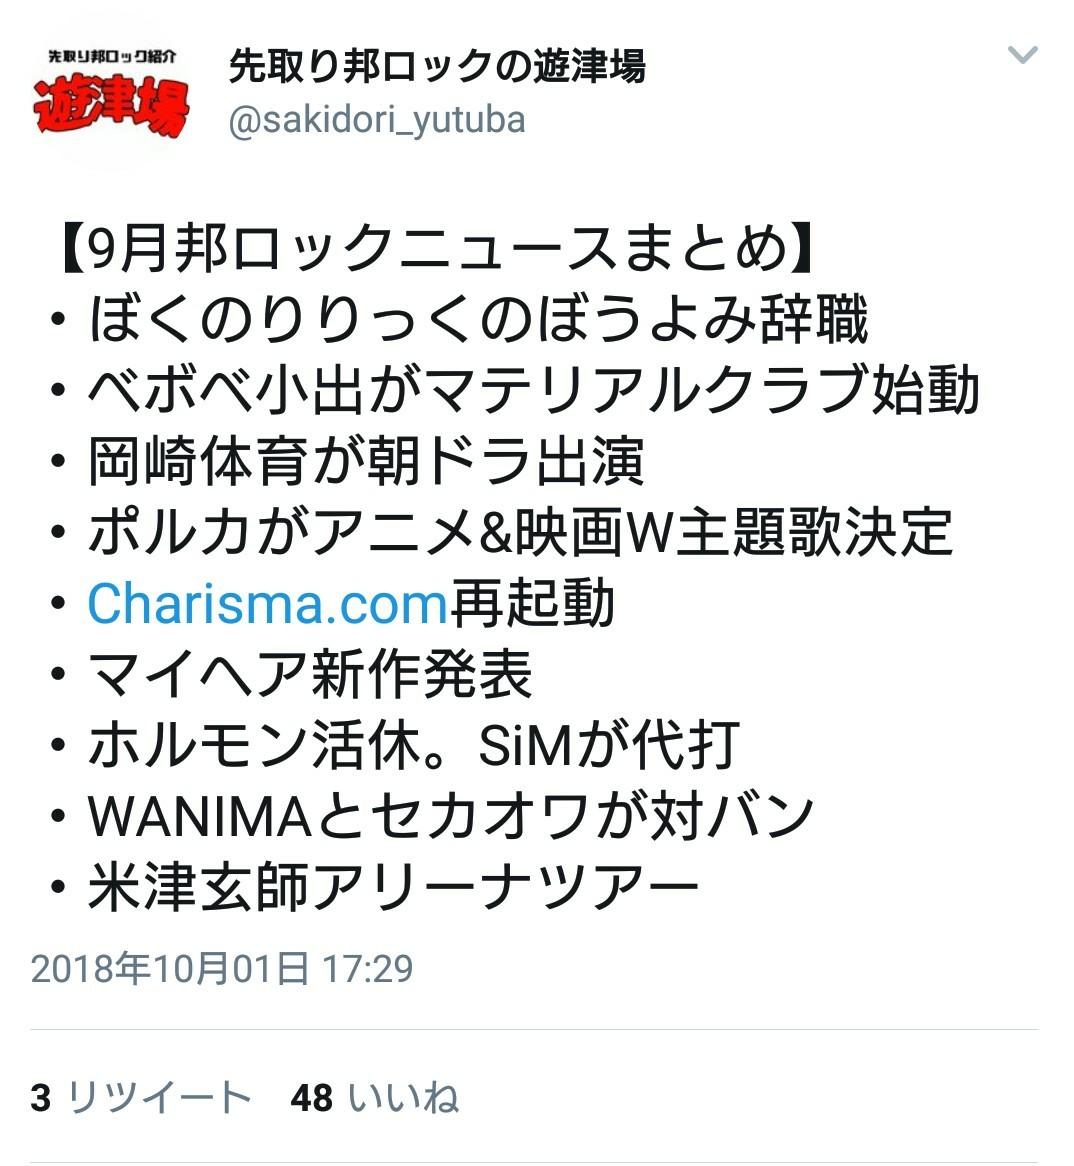 f:id:sakidoriyutsubarock:20181213223837j:plain